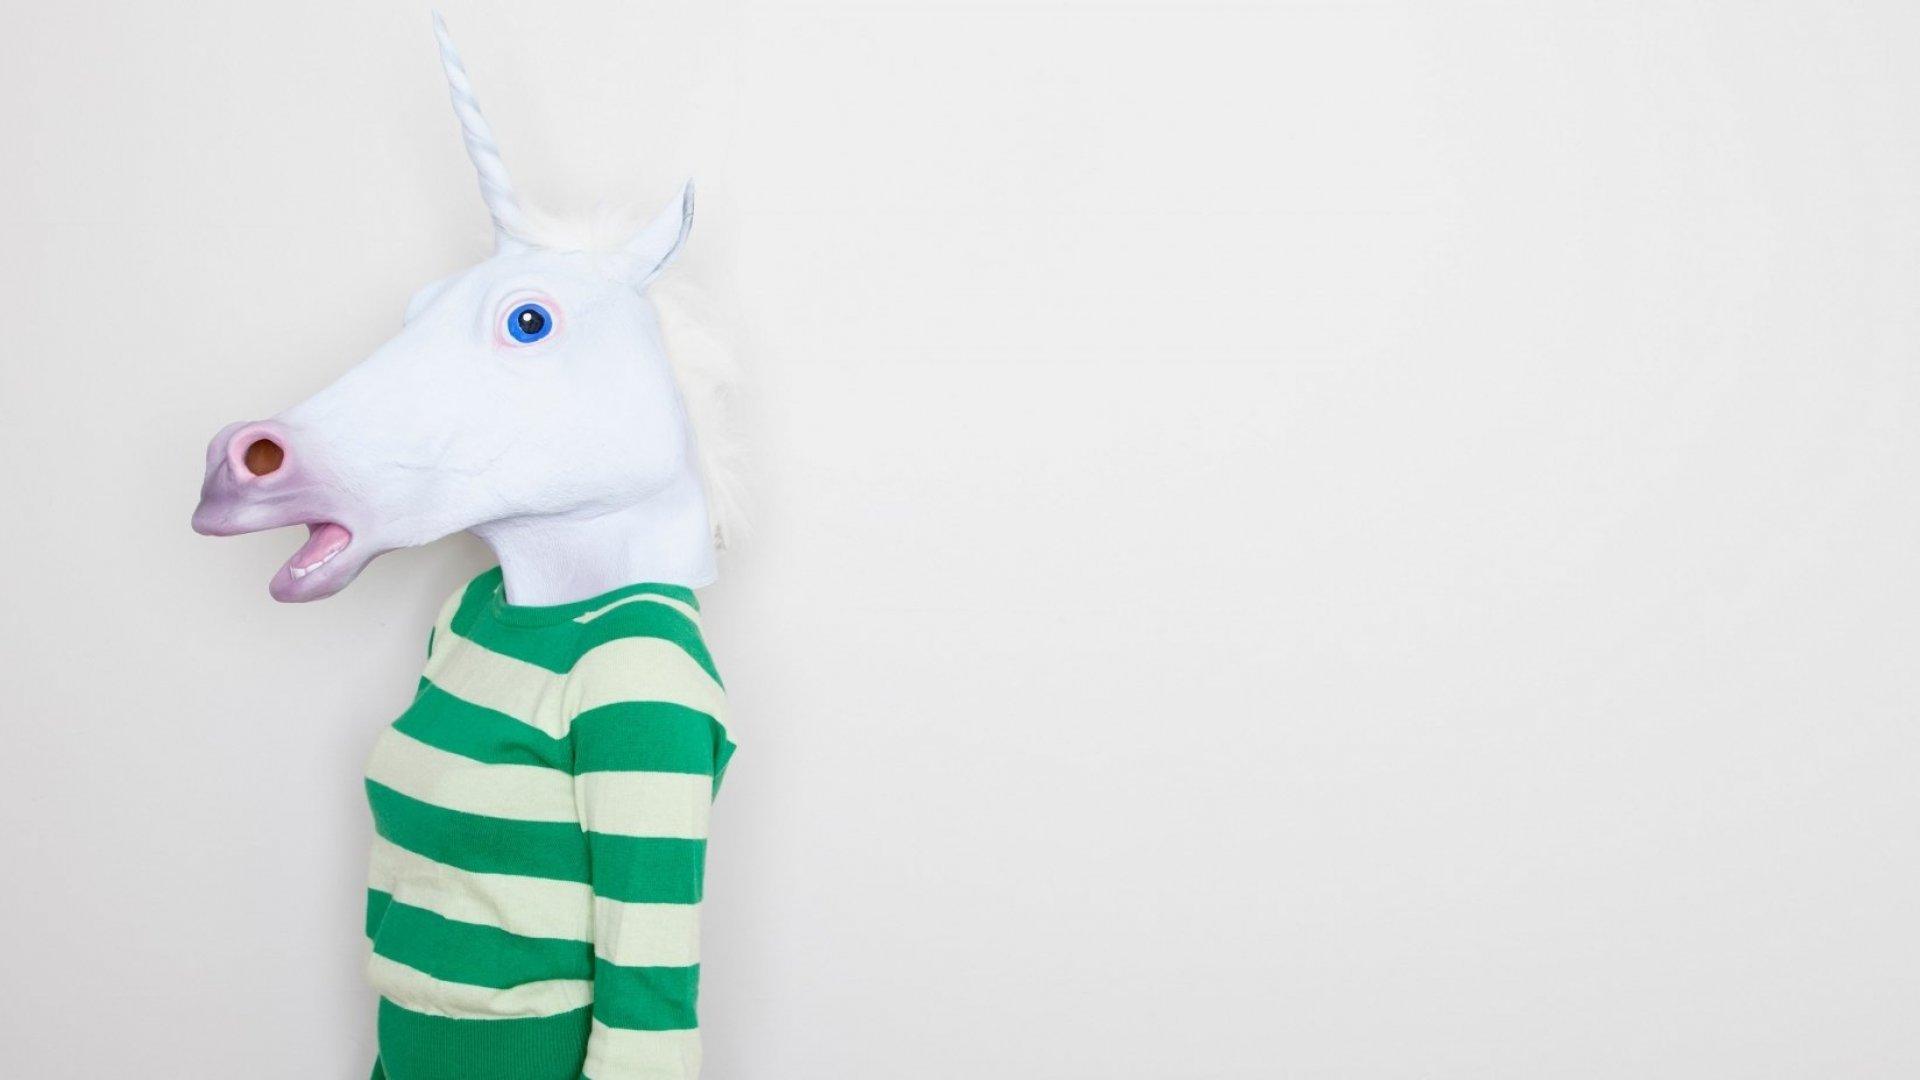 Meet the Corporate VC Backing More Unicorns Than Google